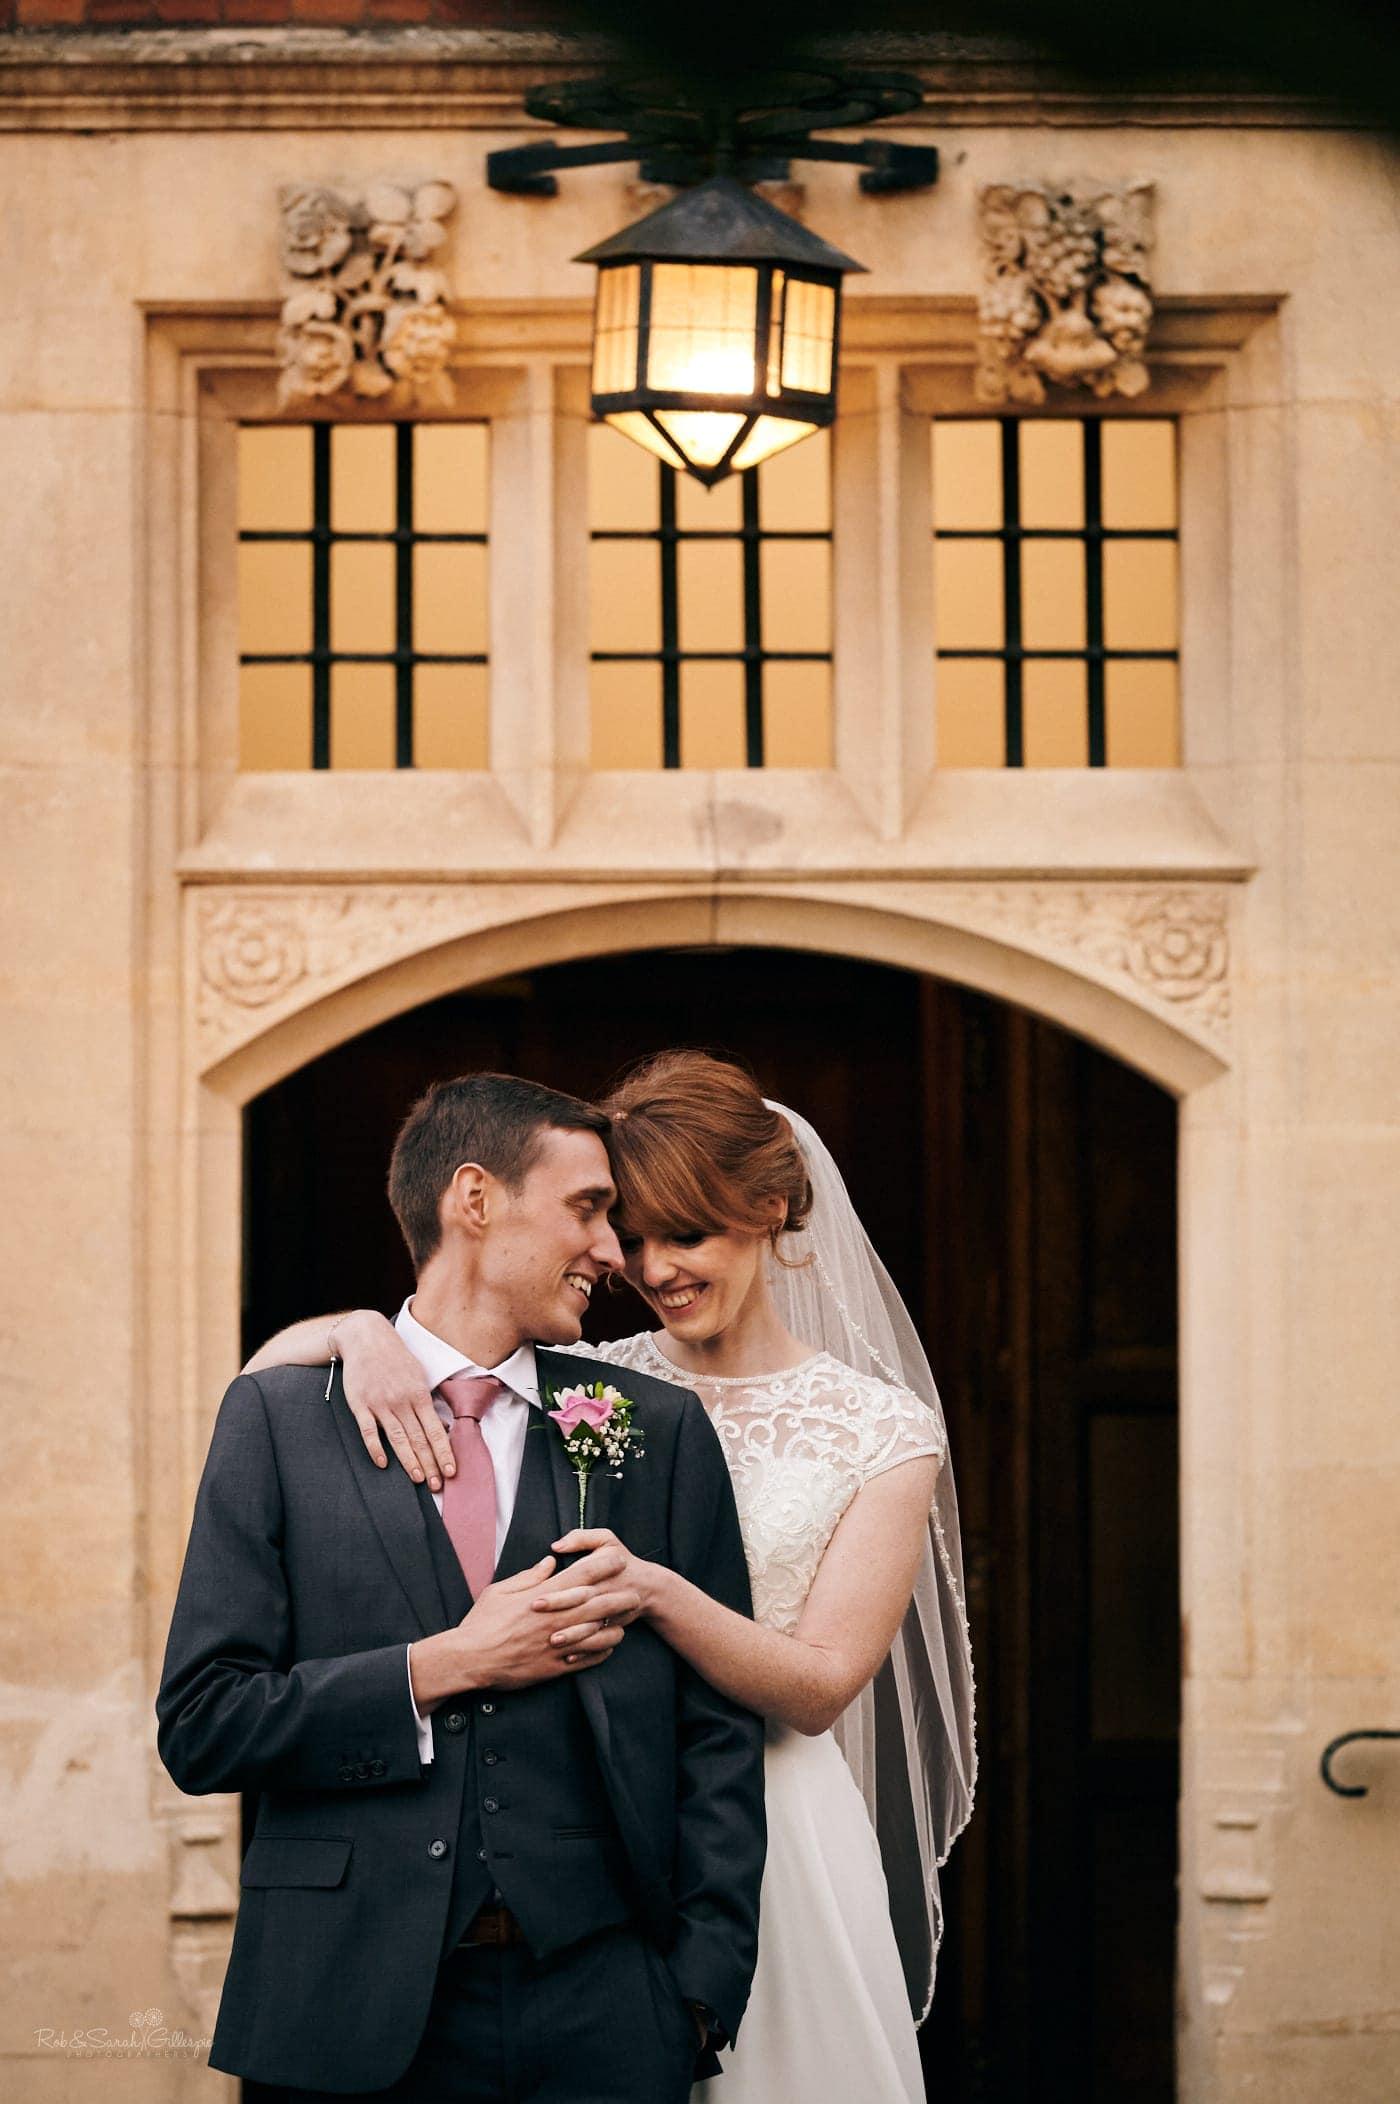 Bride and groom hug outside Pendrell Hall entrance